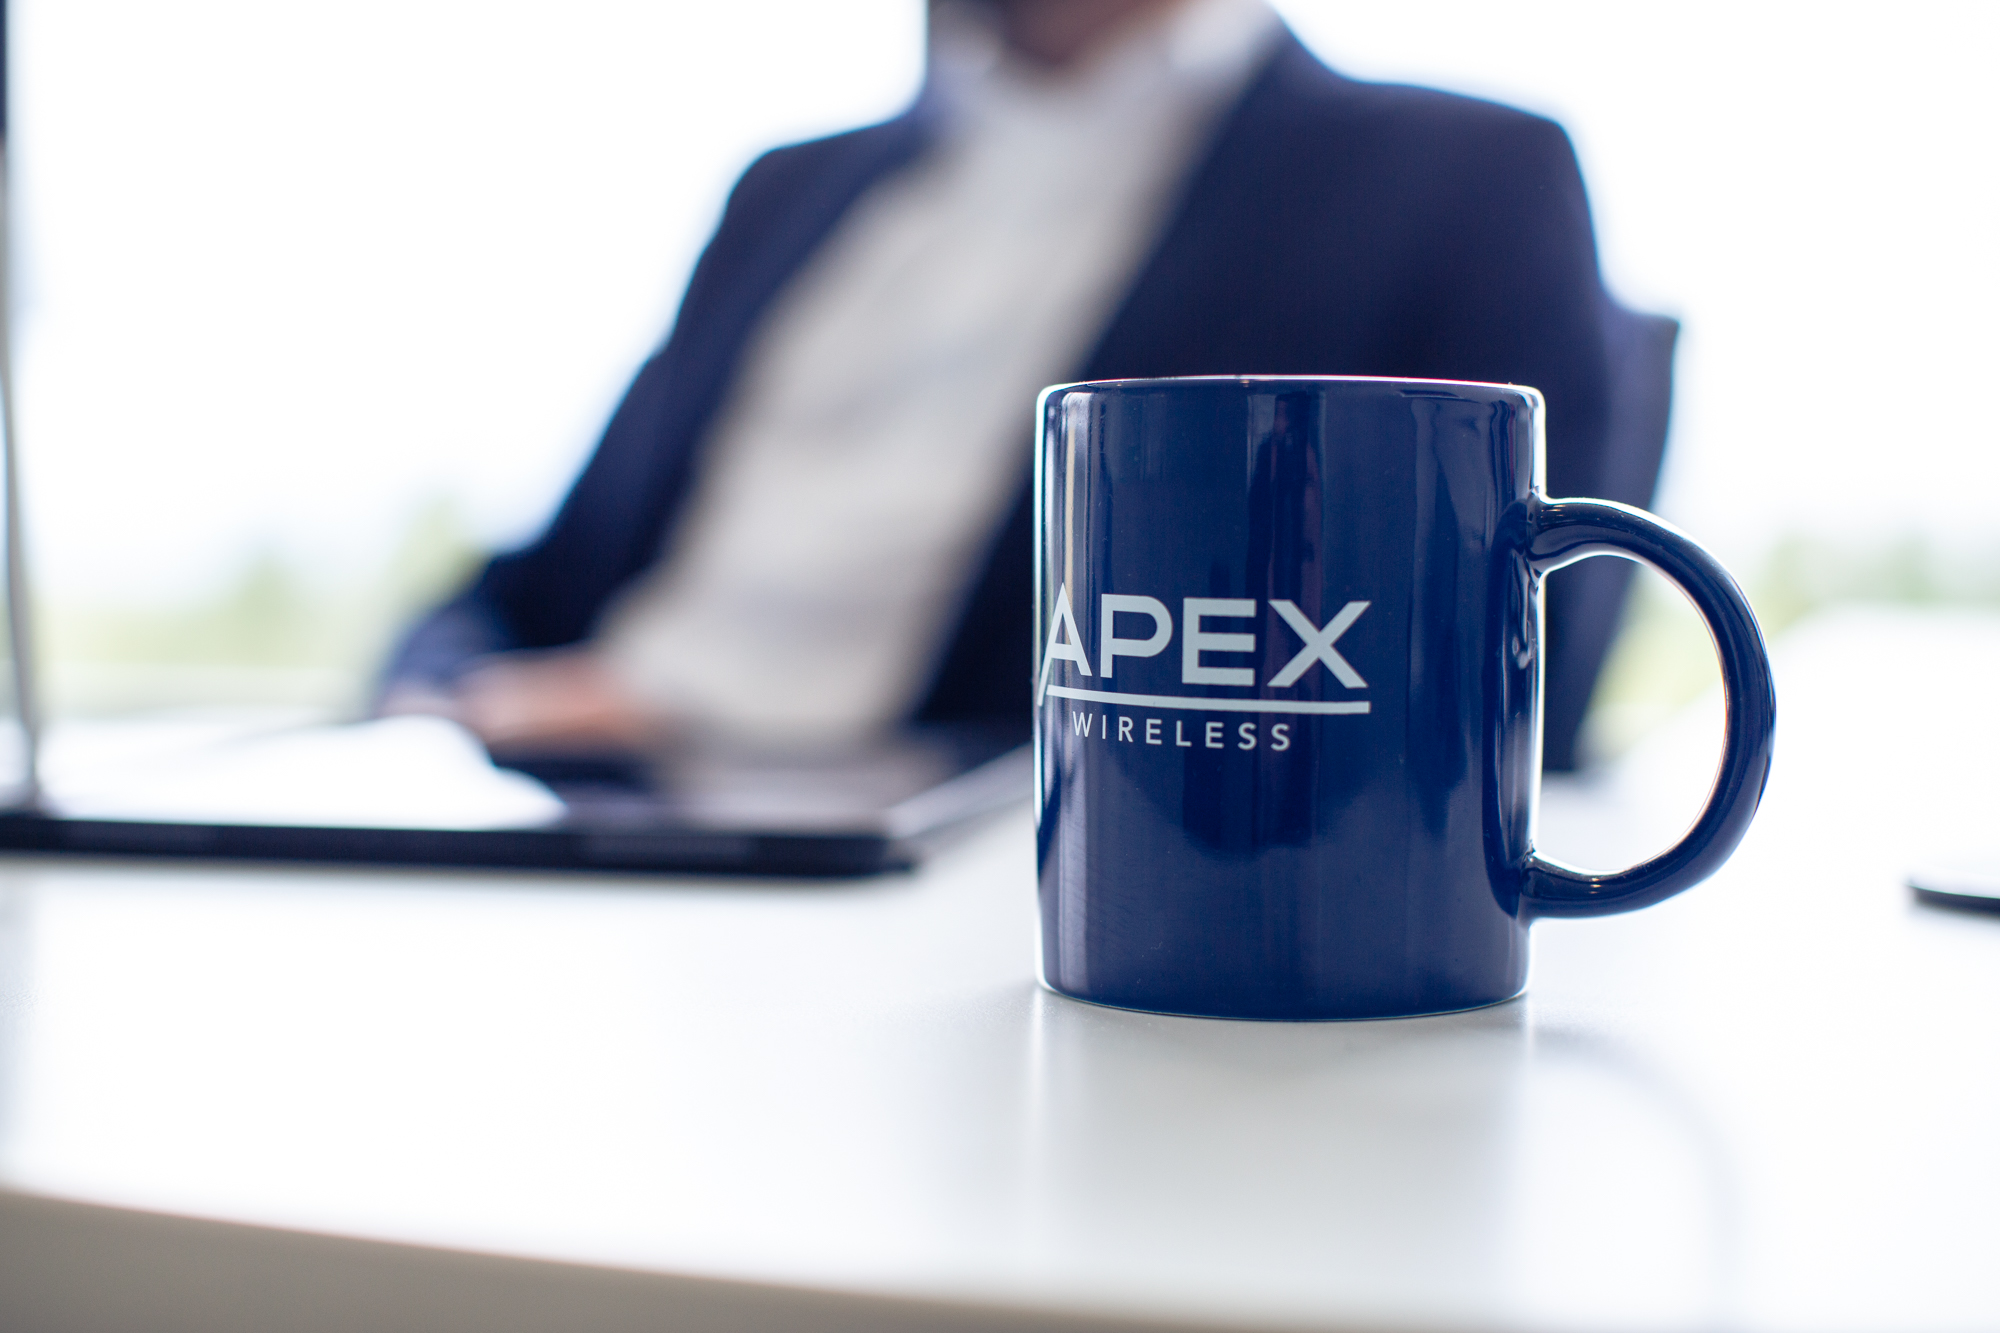 Apex Wireless Coffee mug, a Telus partner, authorized Telus Dealer